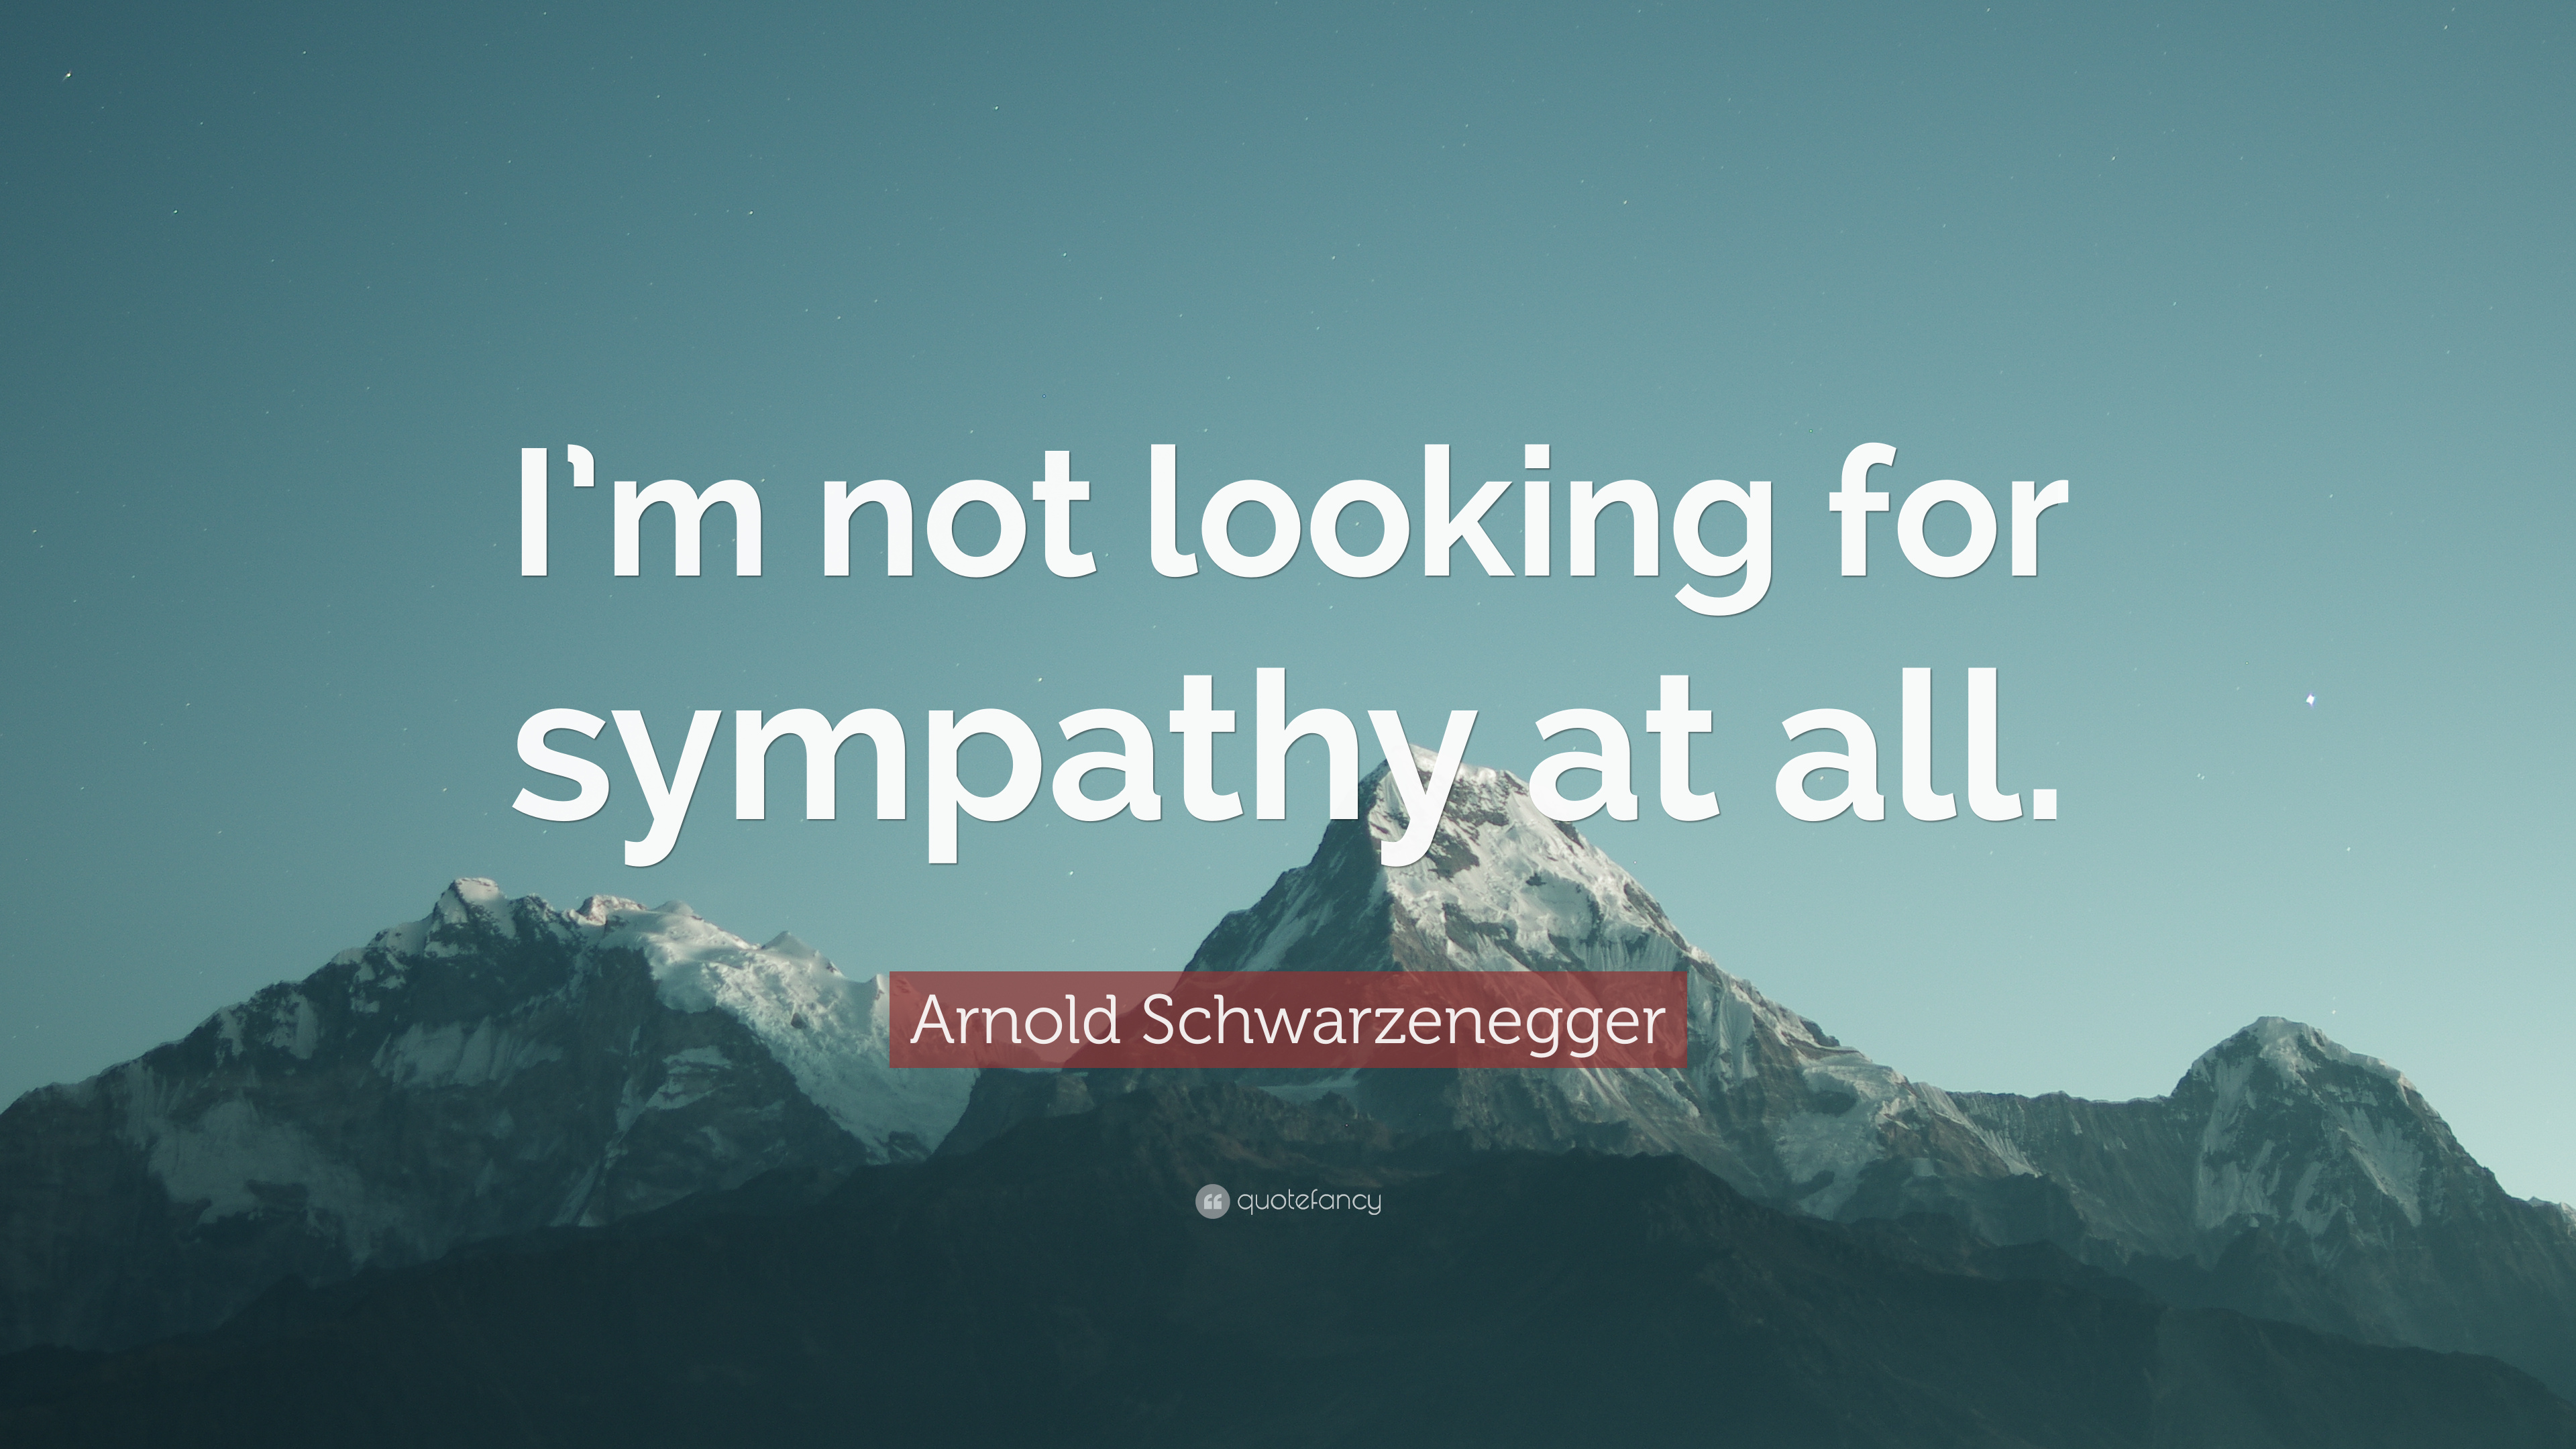 Arnold schwarzenegger quote im not looking for sympathy at all arnold schwarzenegger quote im not looking for sympathy at all thecheapjerseys Gallery